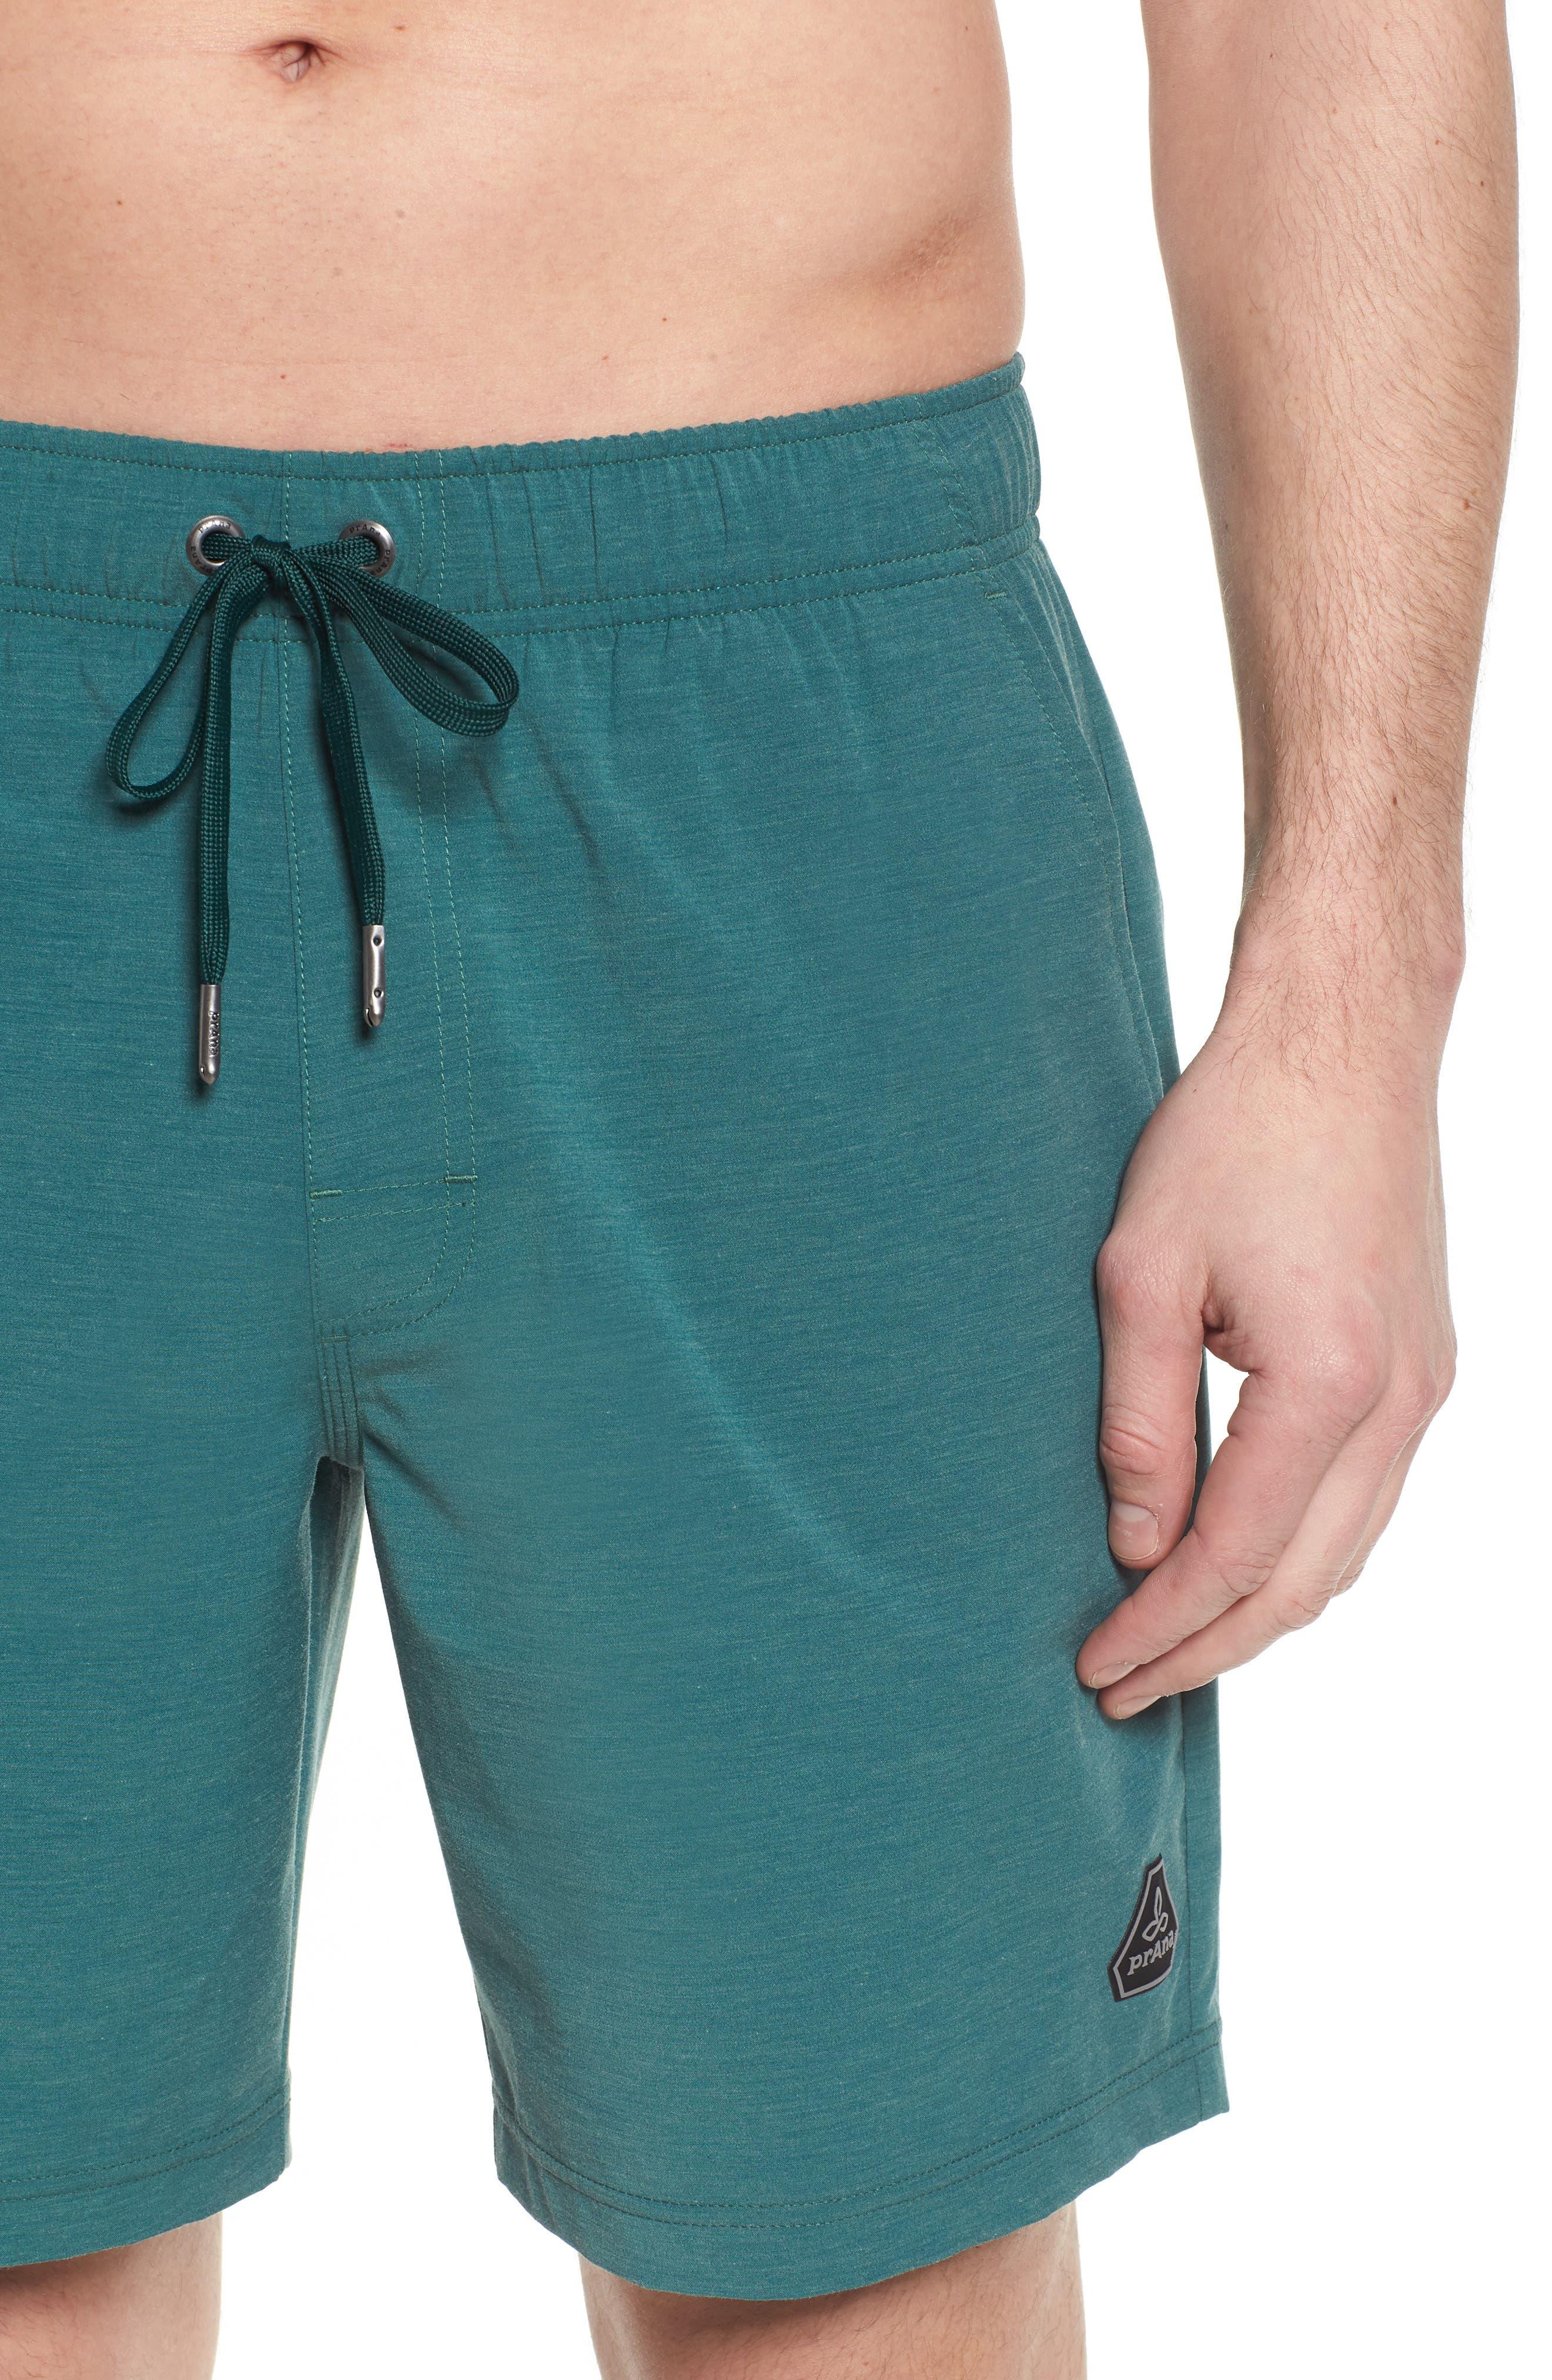 Metric Board Shorts,                             Alternate thumbnail 4, color,                             300